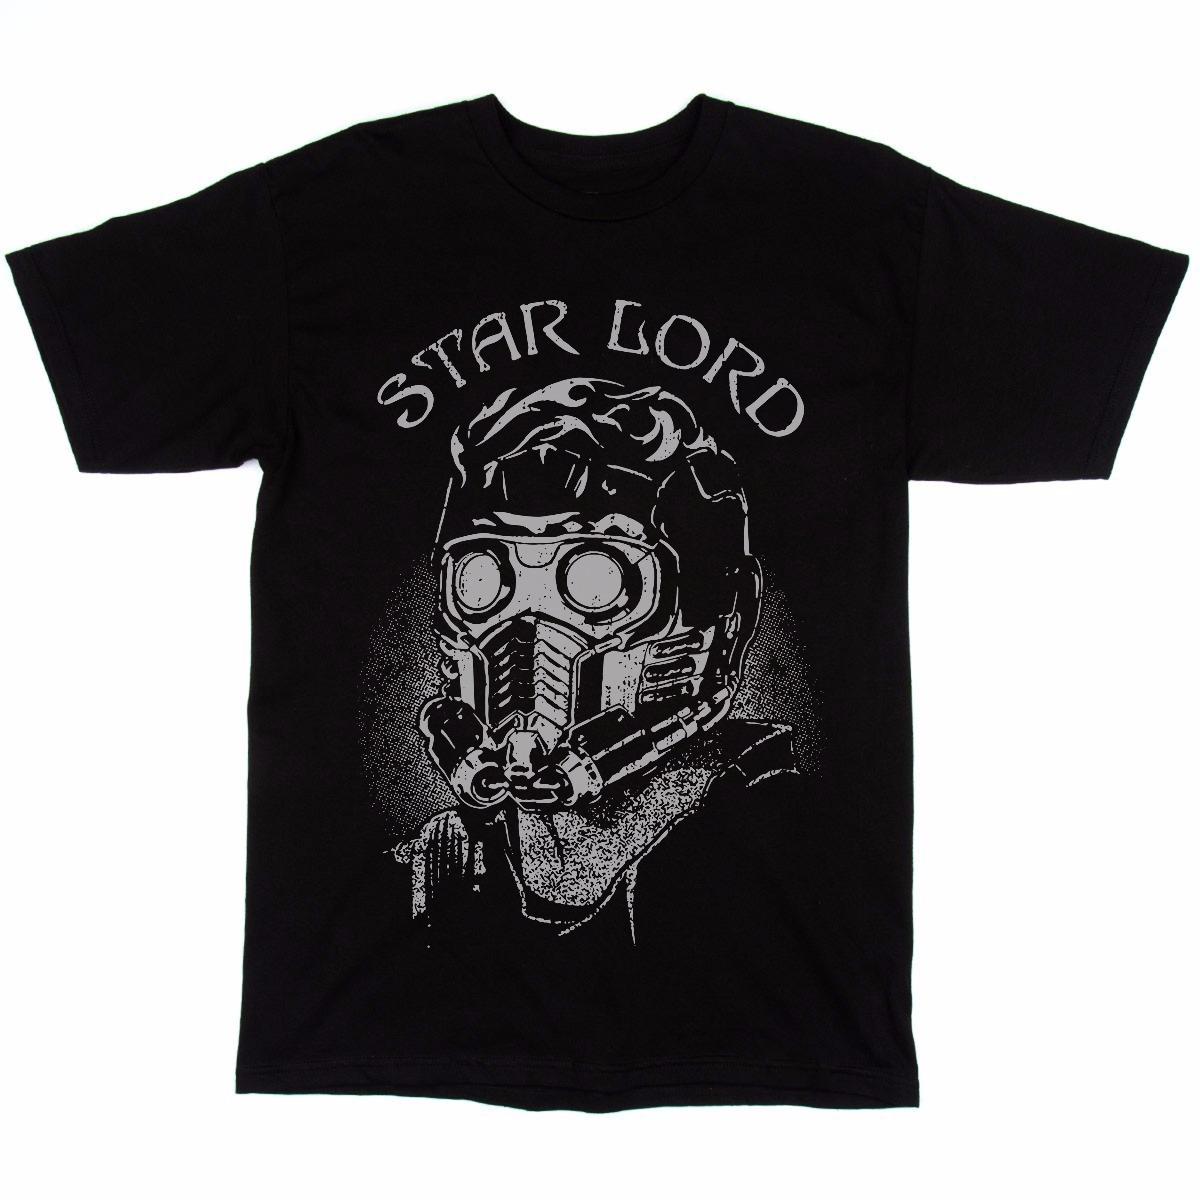 camisa guardiões da galaxia - star lord black sabbath. Carregando zoom. e0b1c11c8791b